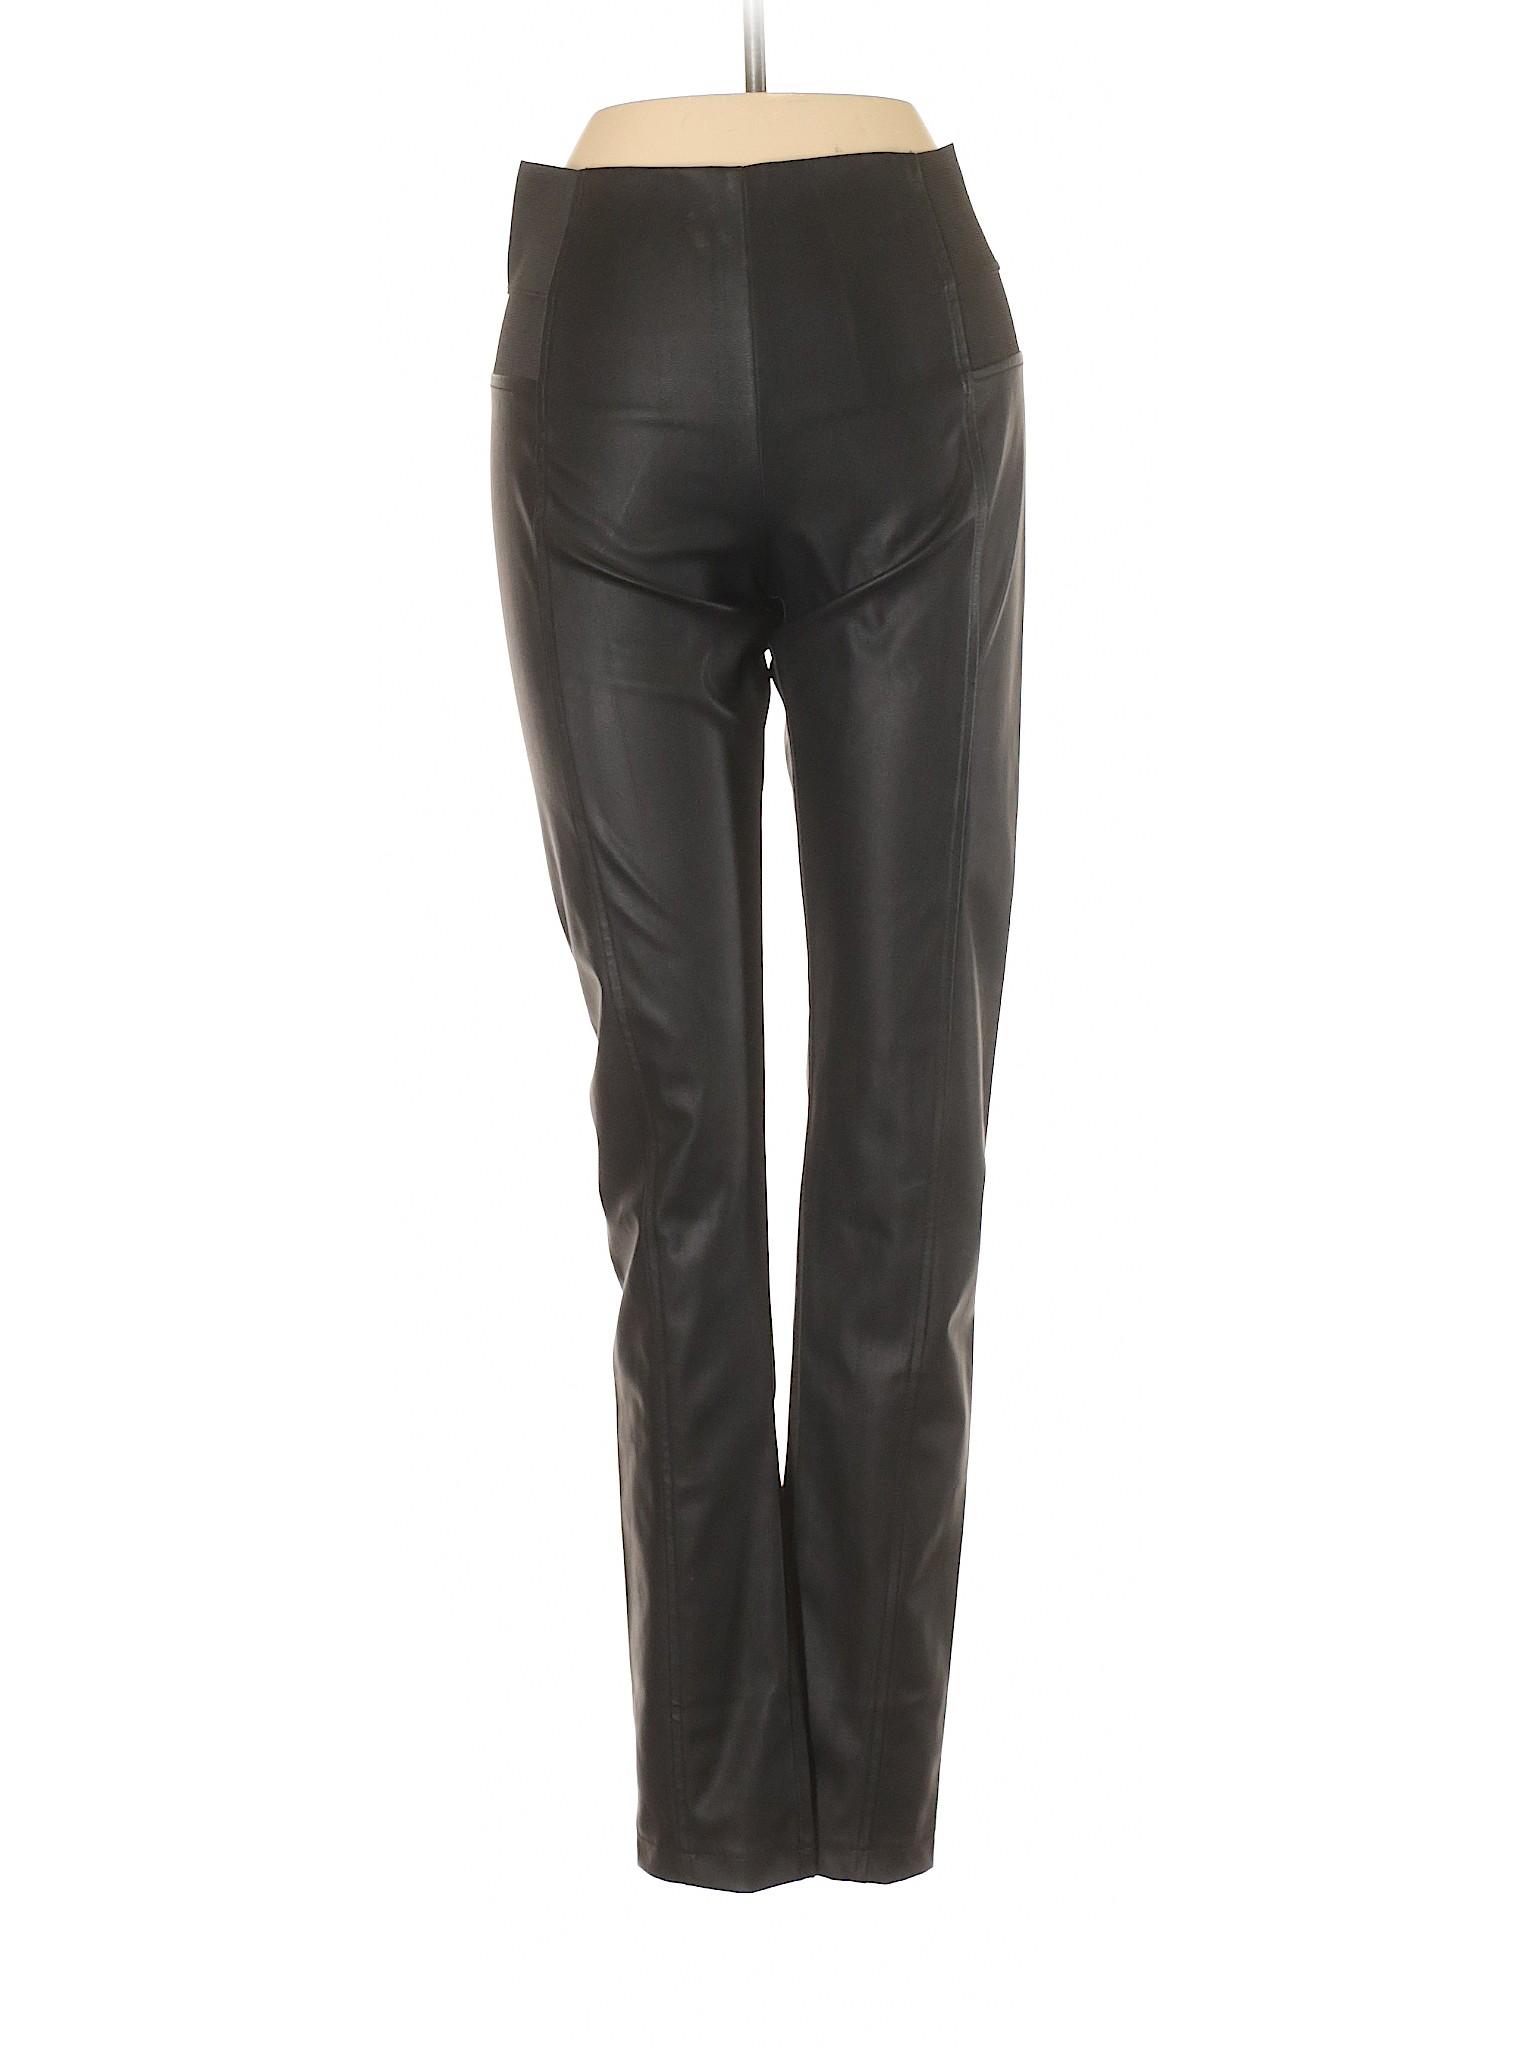 Glamorous Boutique Glamorous Faux Leather Pants Boutique Pants Boutique Leather Glamorous Faux 7Cnqwnxp